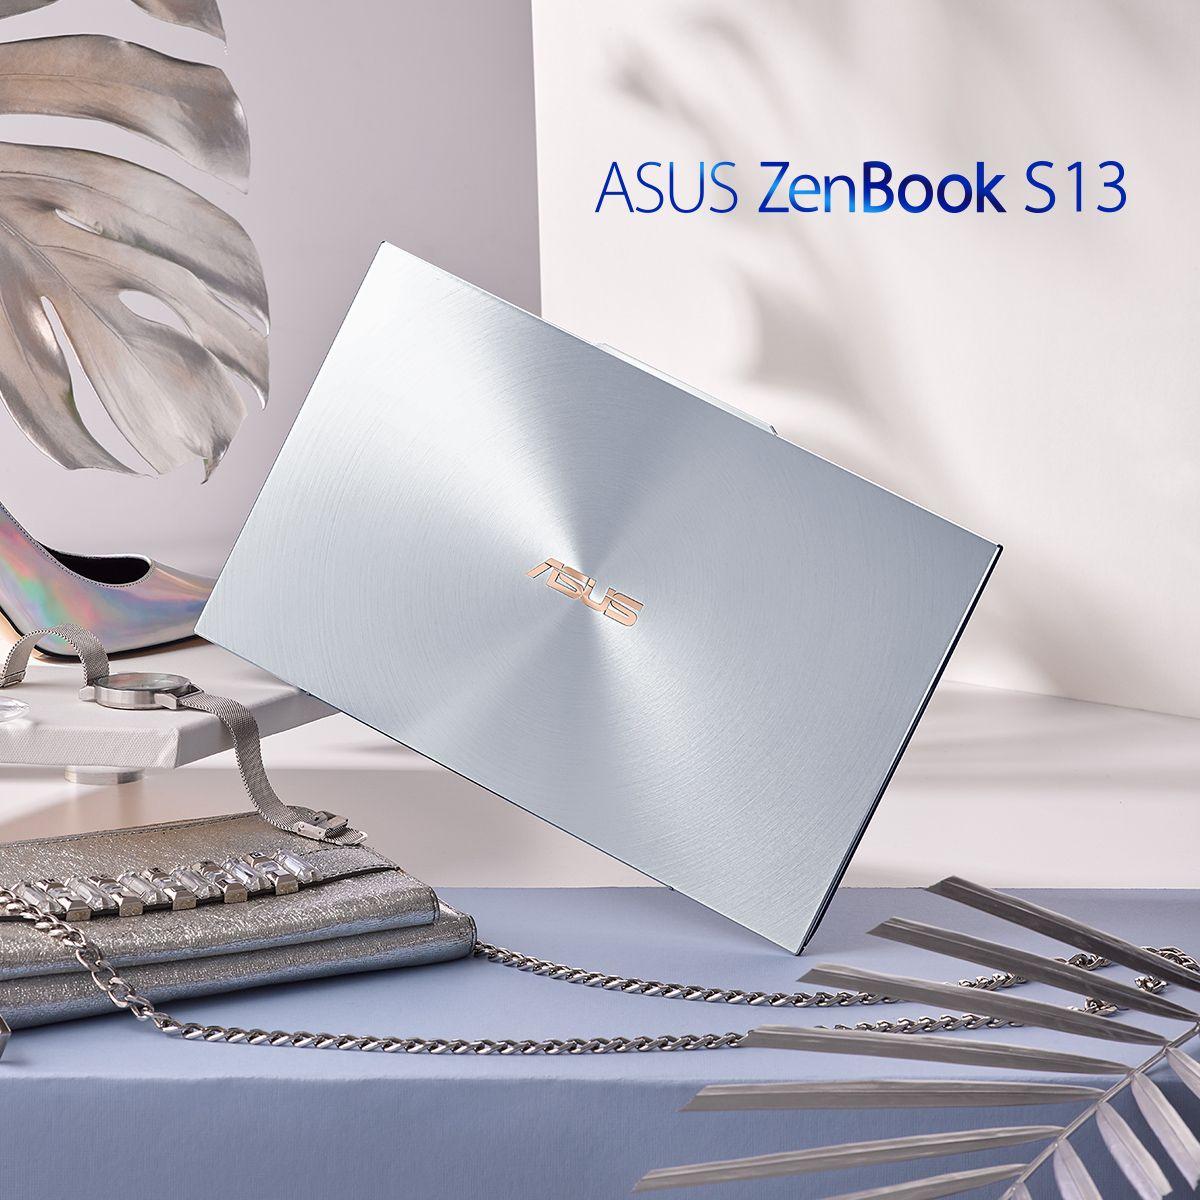 Asus Zenbook S13 Breathtaking Design Lovingly Crafted Asus Office Gadgets Harman Kardon